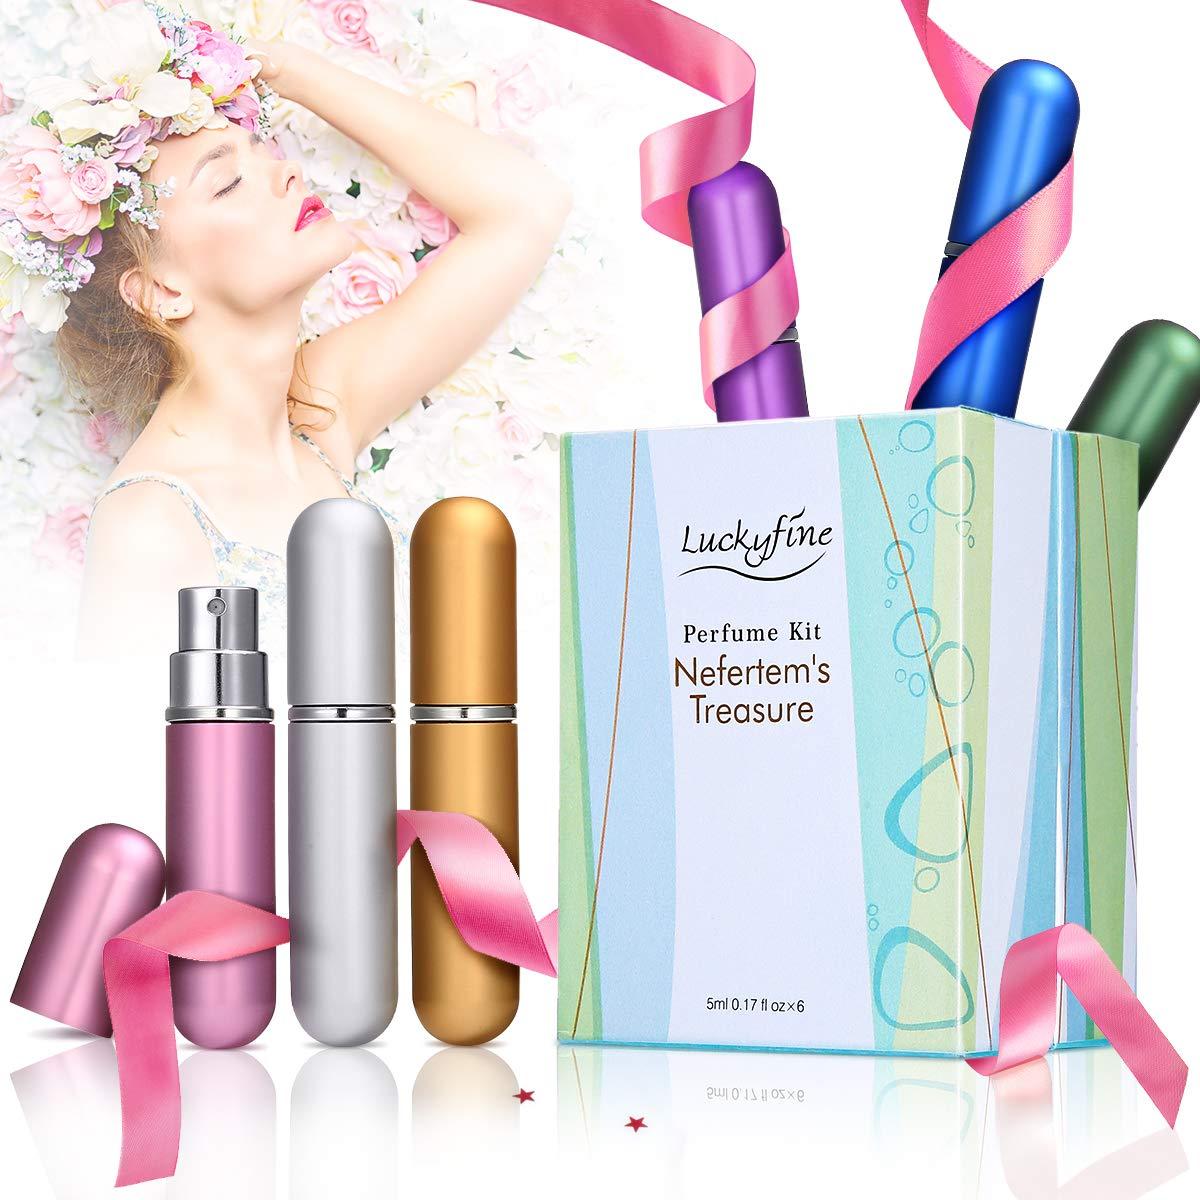 Parfum Set, Luckyfine Miniatur Frauen Eau de Parfum Spray Geschenkset 6×5 ml